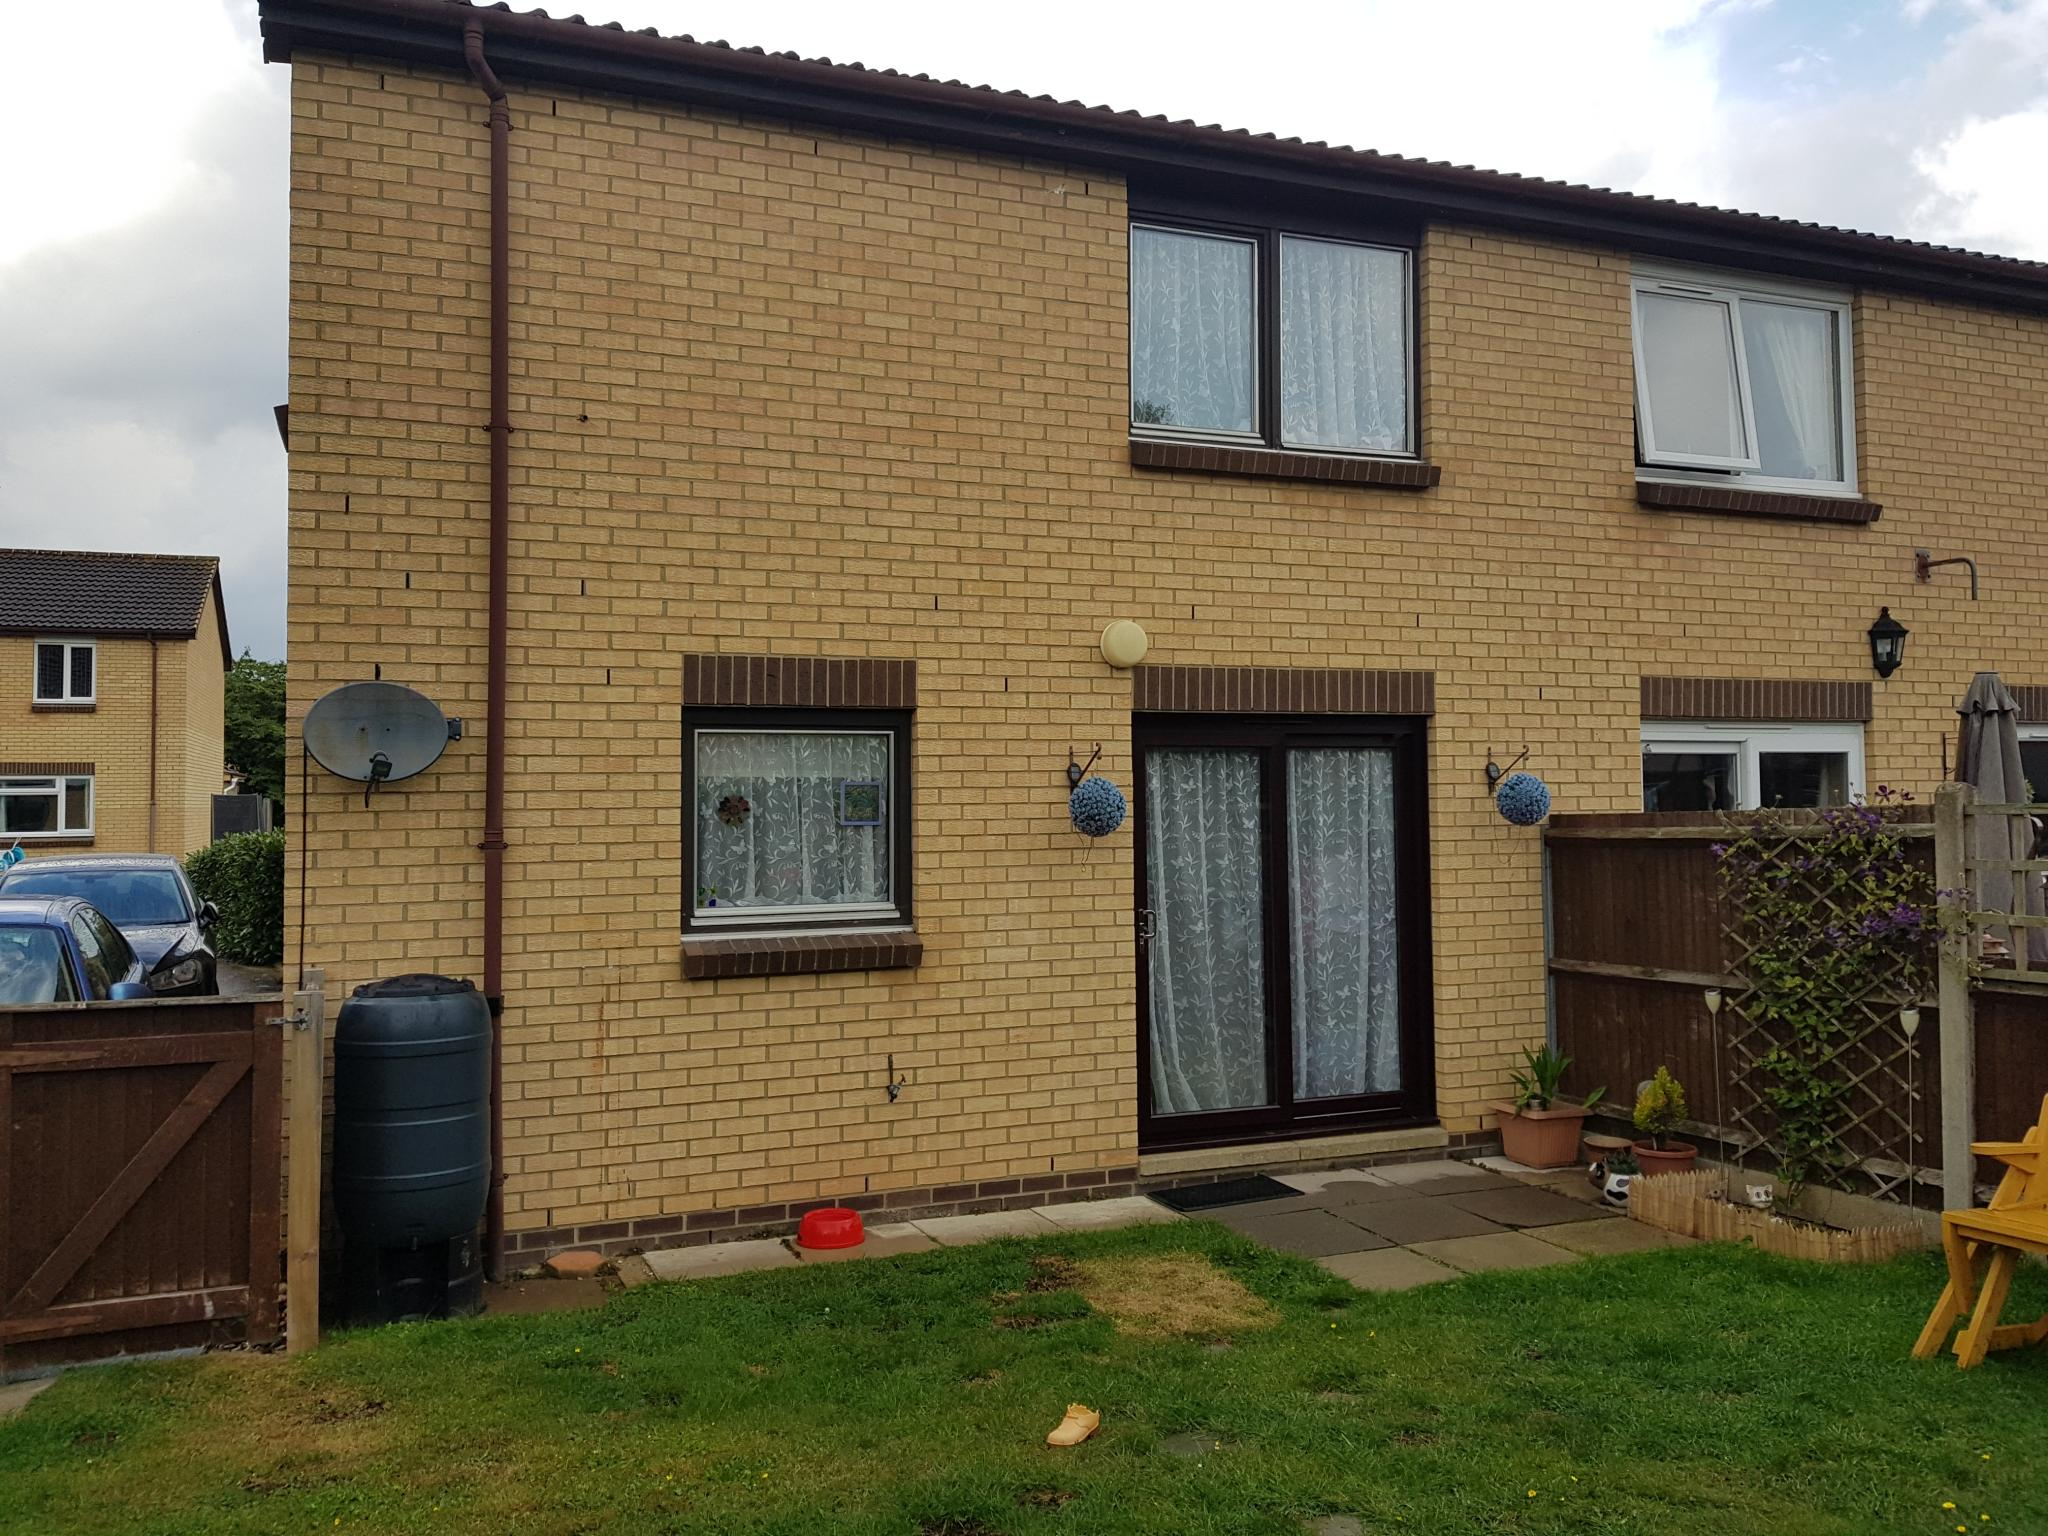 2 bedroom semi-detached house SSTC in Rendlesham, Woodbridge - Photograph 9